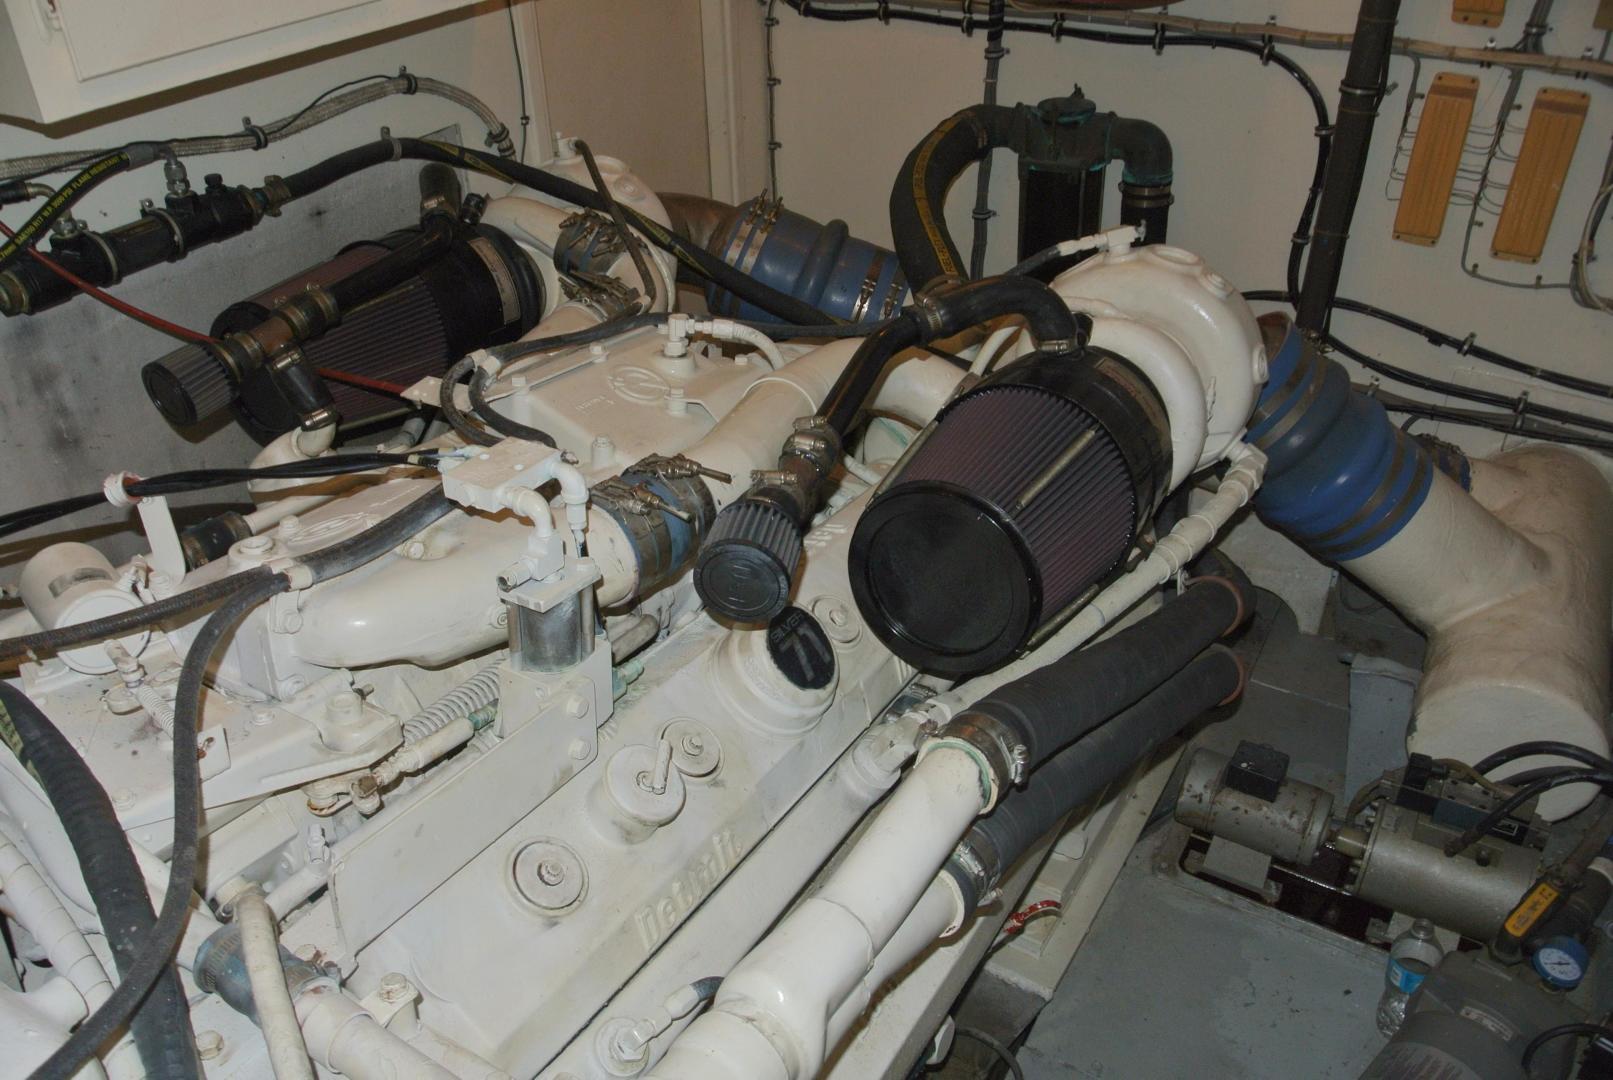 Hatteras-67-Cockpit-Motor-Yacht-1988-Lady-Encore-Saint-Petersburg-Florida-United-States-E/R-926203